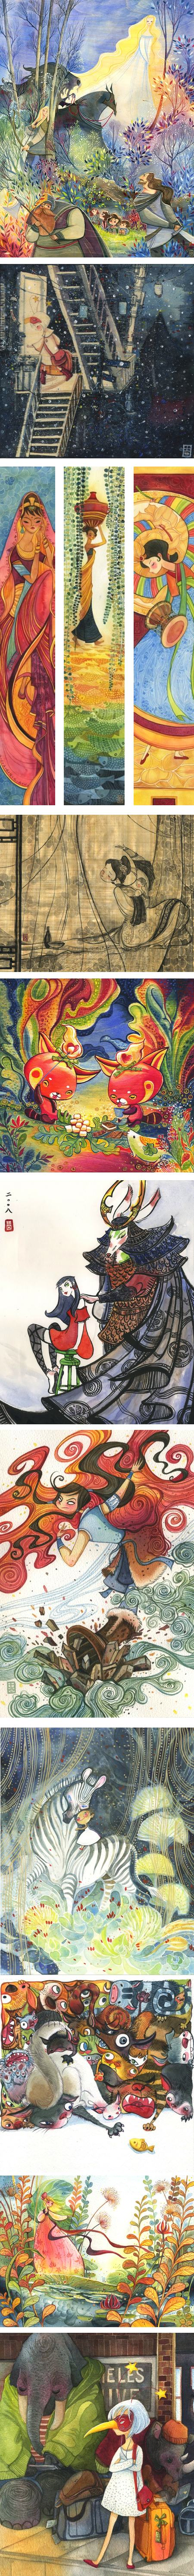 Alina Chau, illustration